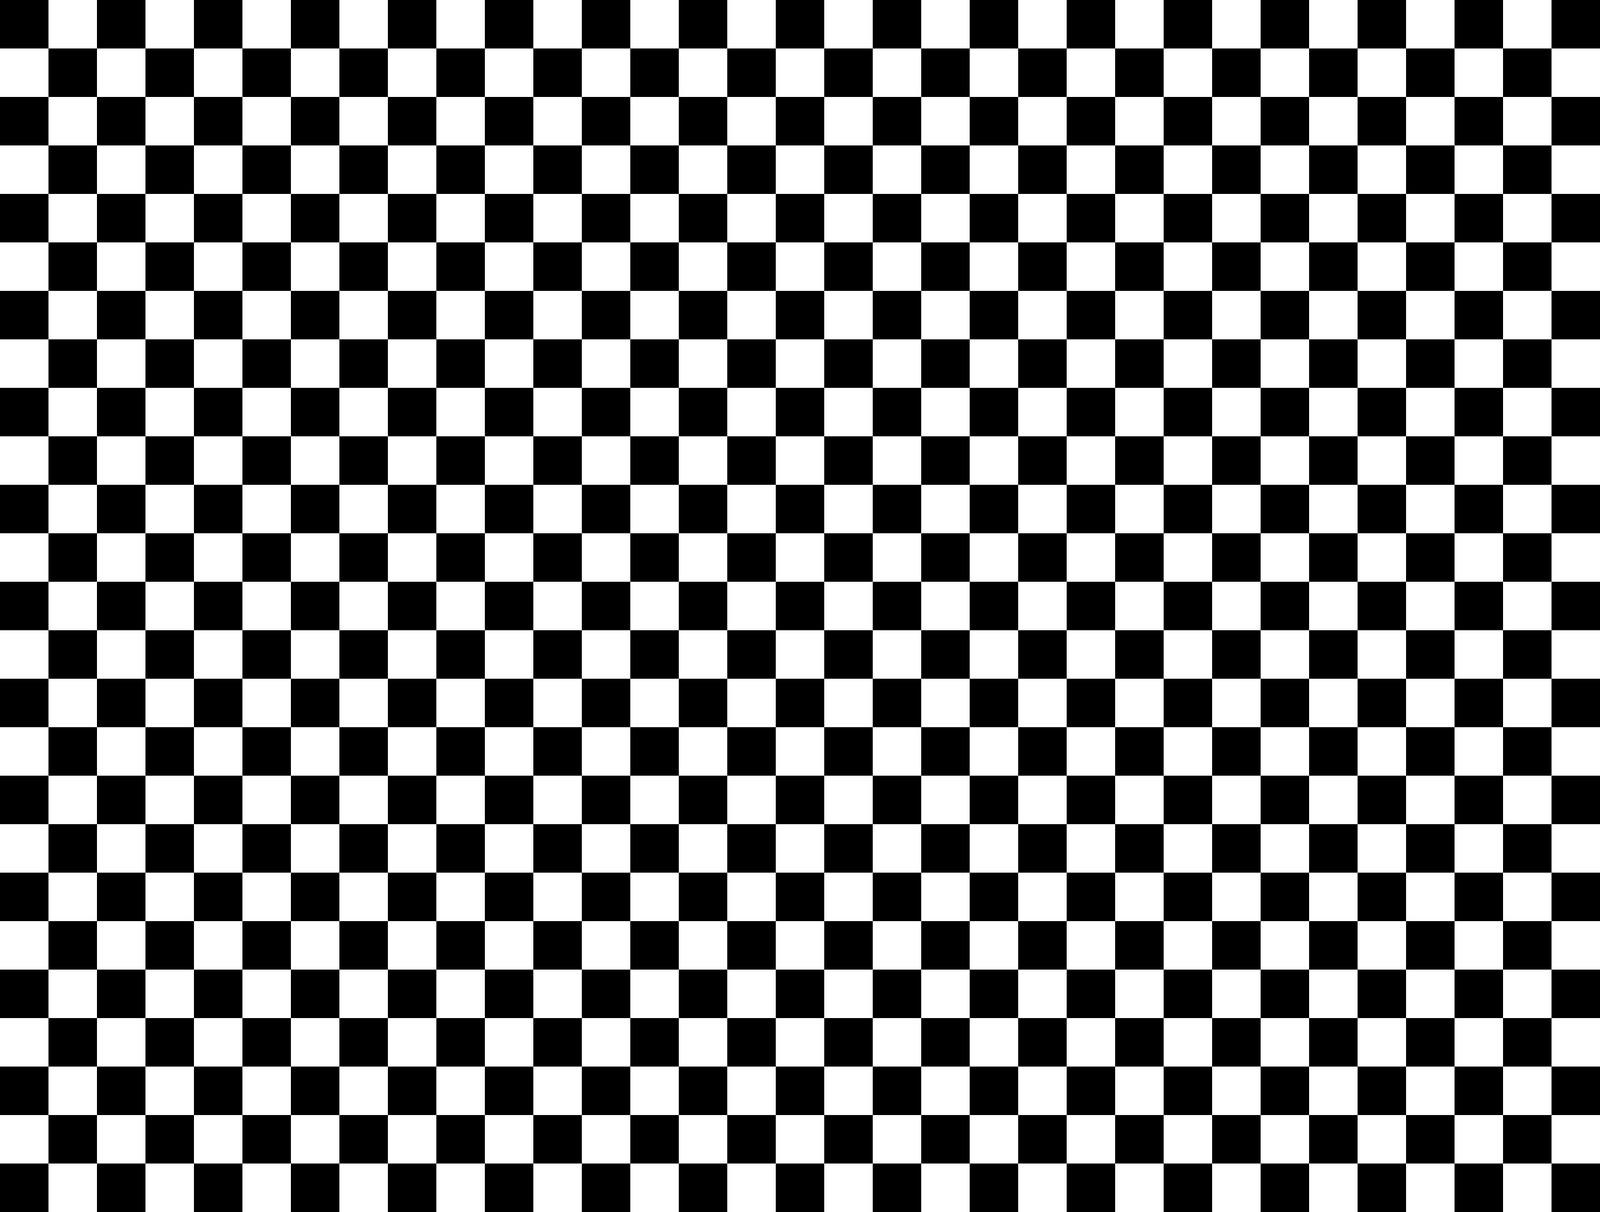 [30+] Black and White Check Wallpaper on WallpaperSafari